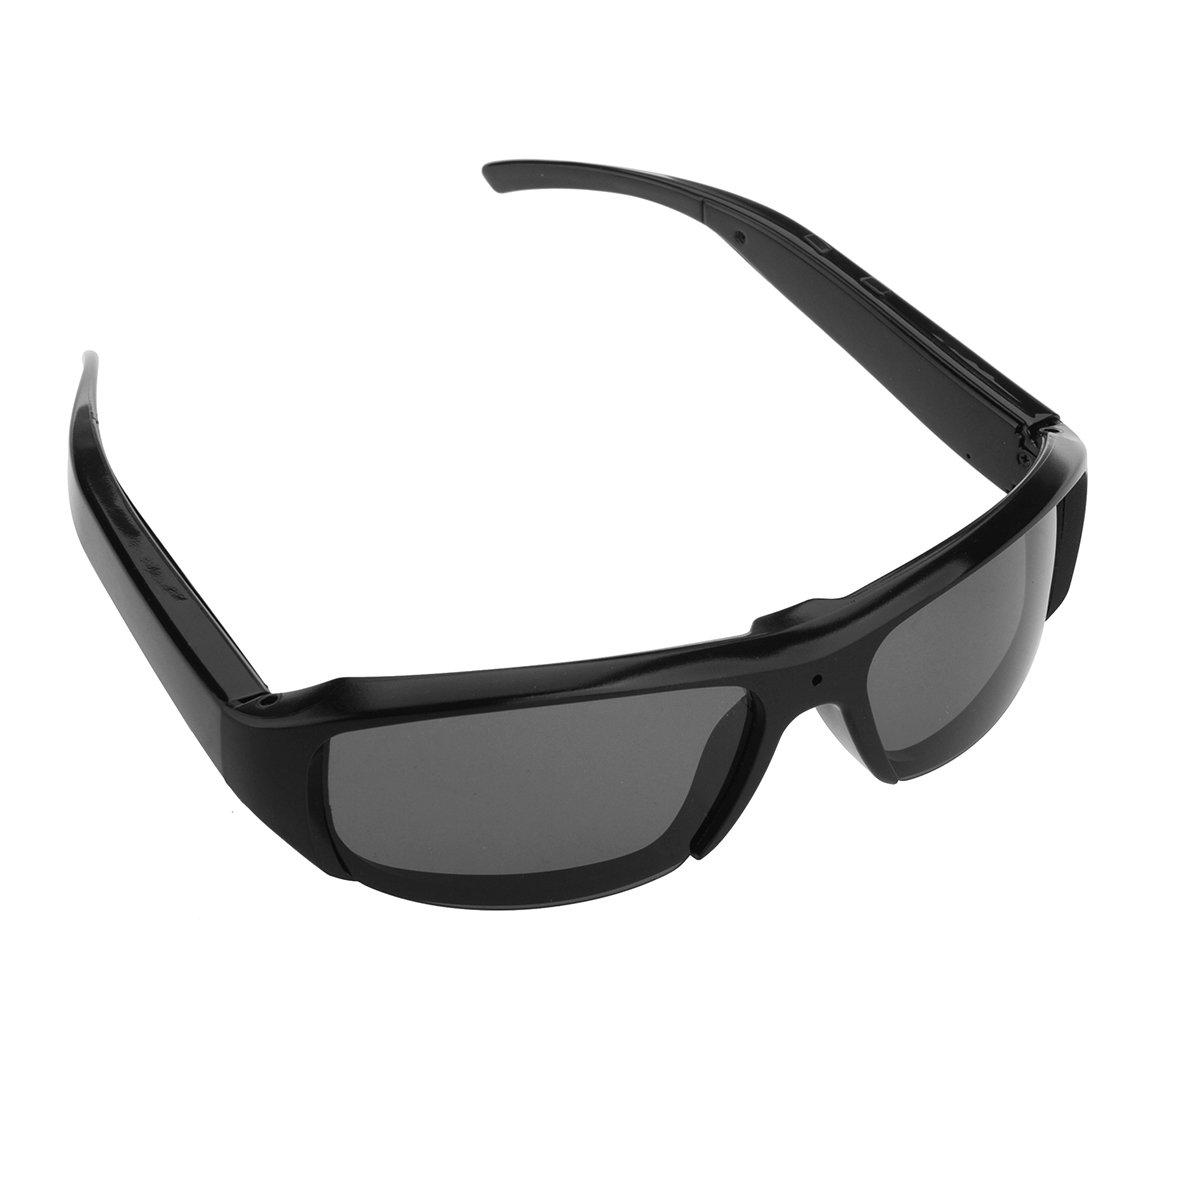 Spy Camera Occhiali, OMOUP HD 1080P 16GB Telecamera Nascosta Glasses Sport Videocamere DVR Spia Pinhole Occhiali